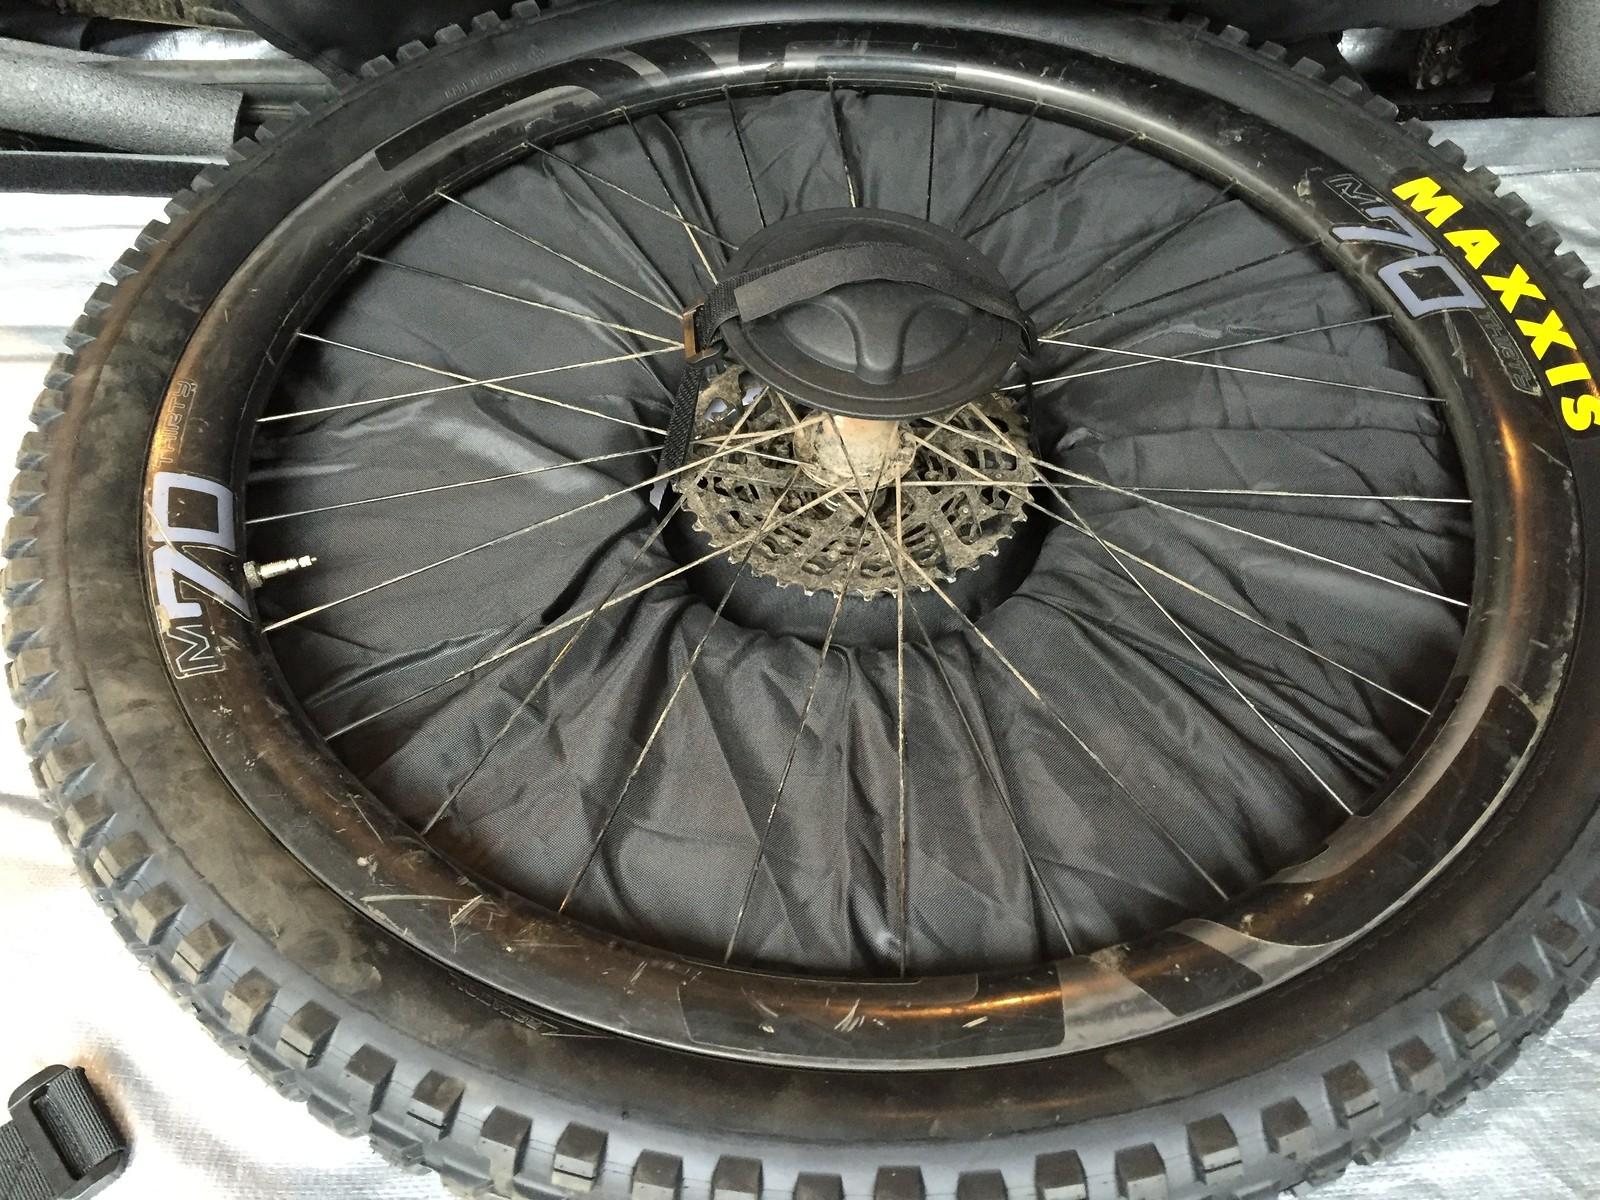 2016-03-20 12 33 08 - mutton - Mountain Biking Pictures - Vital MTB